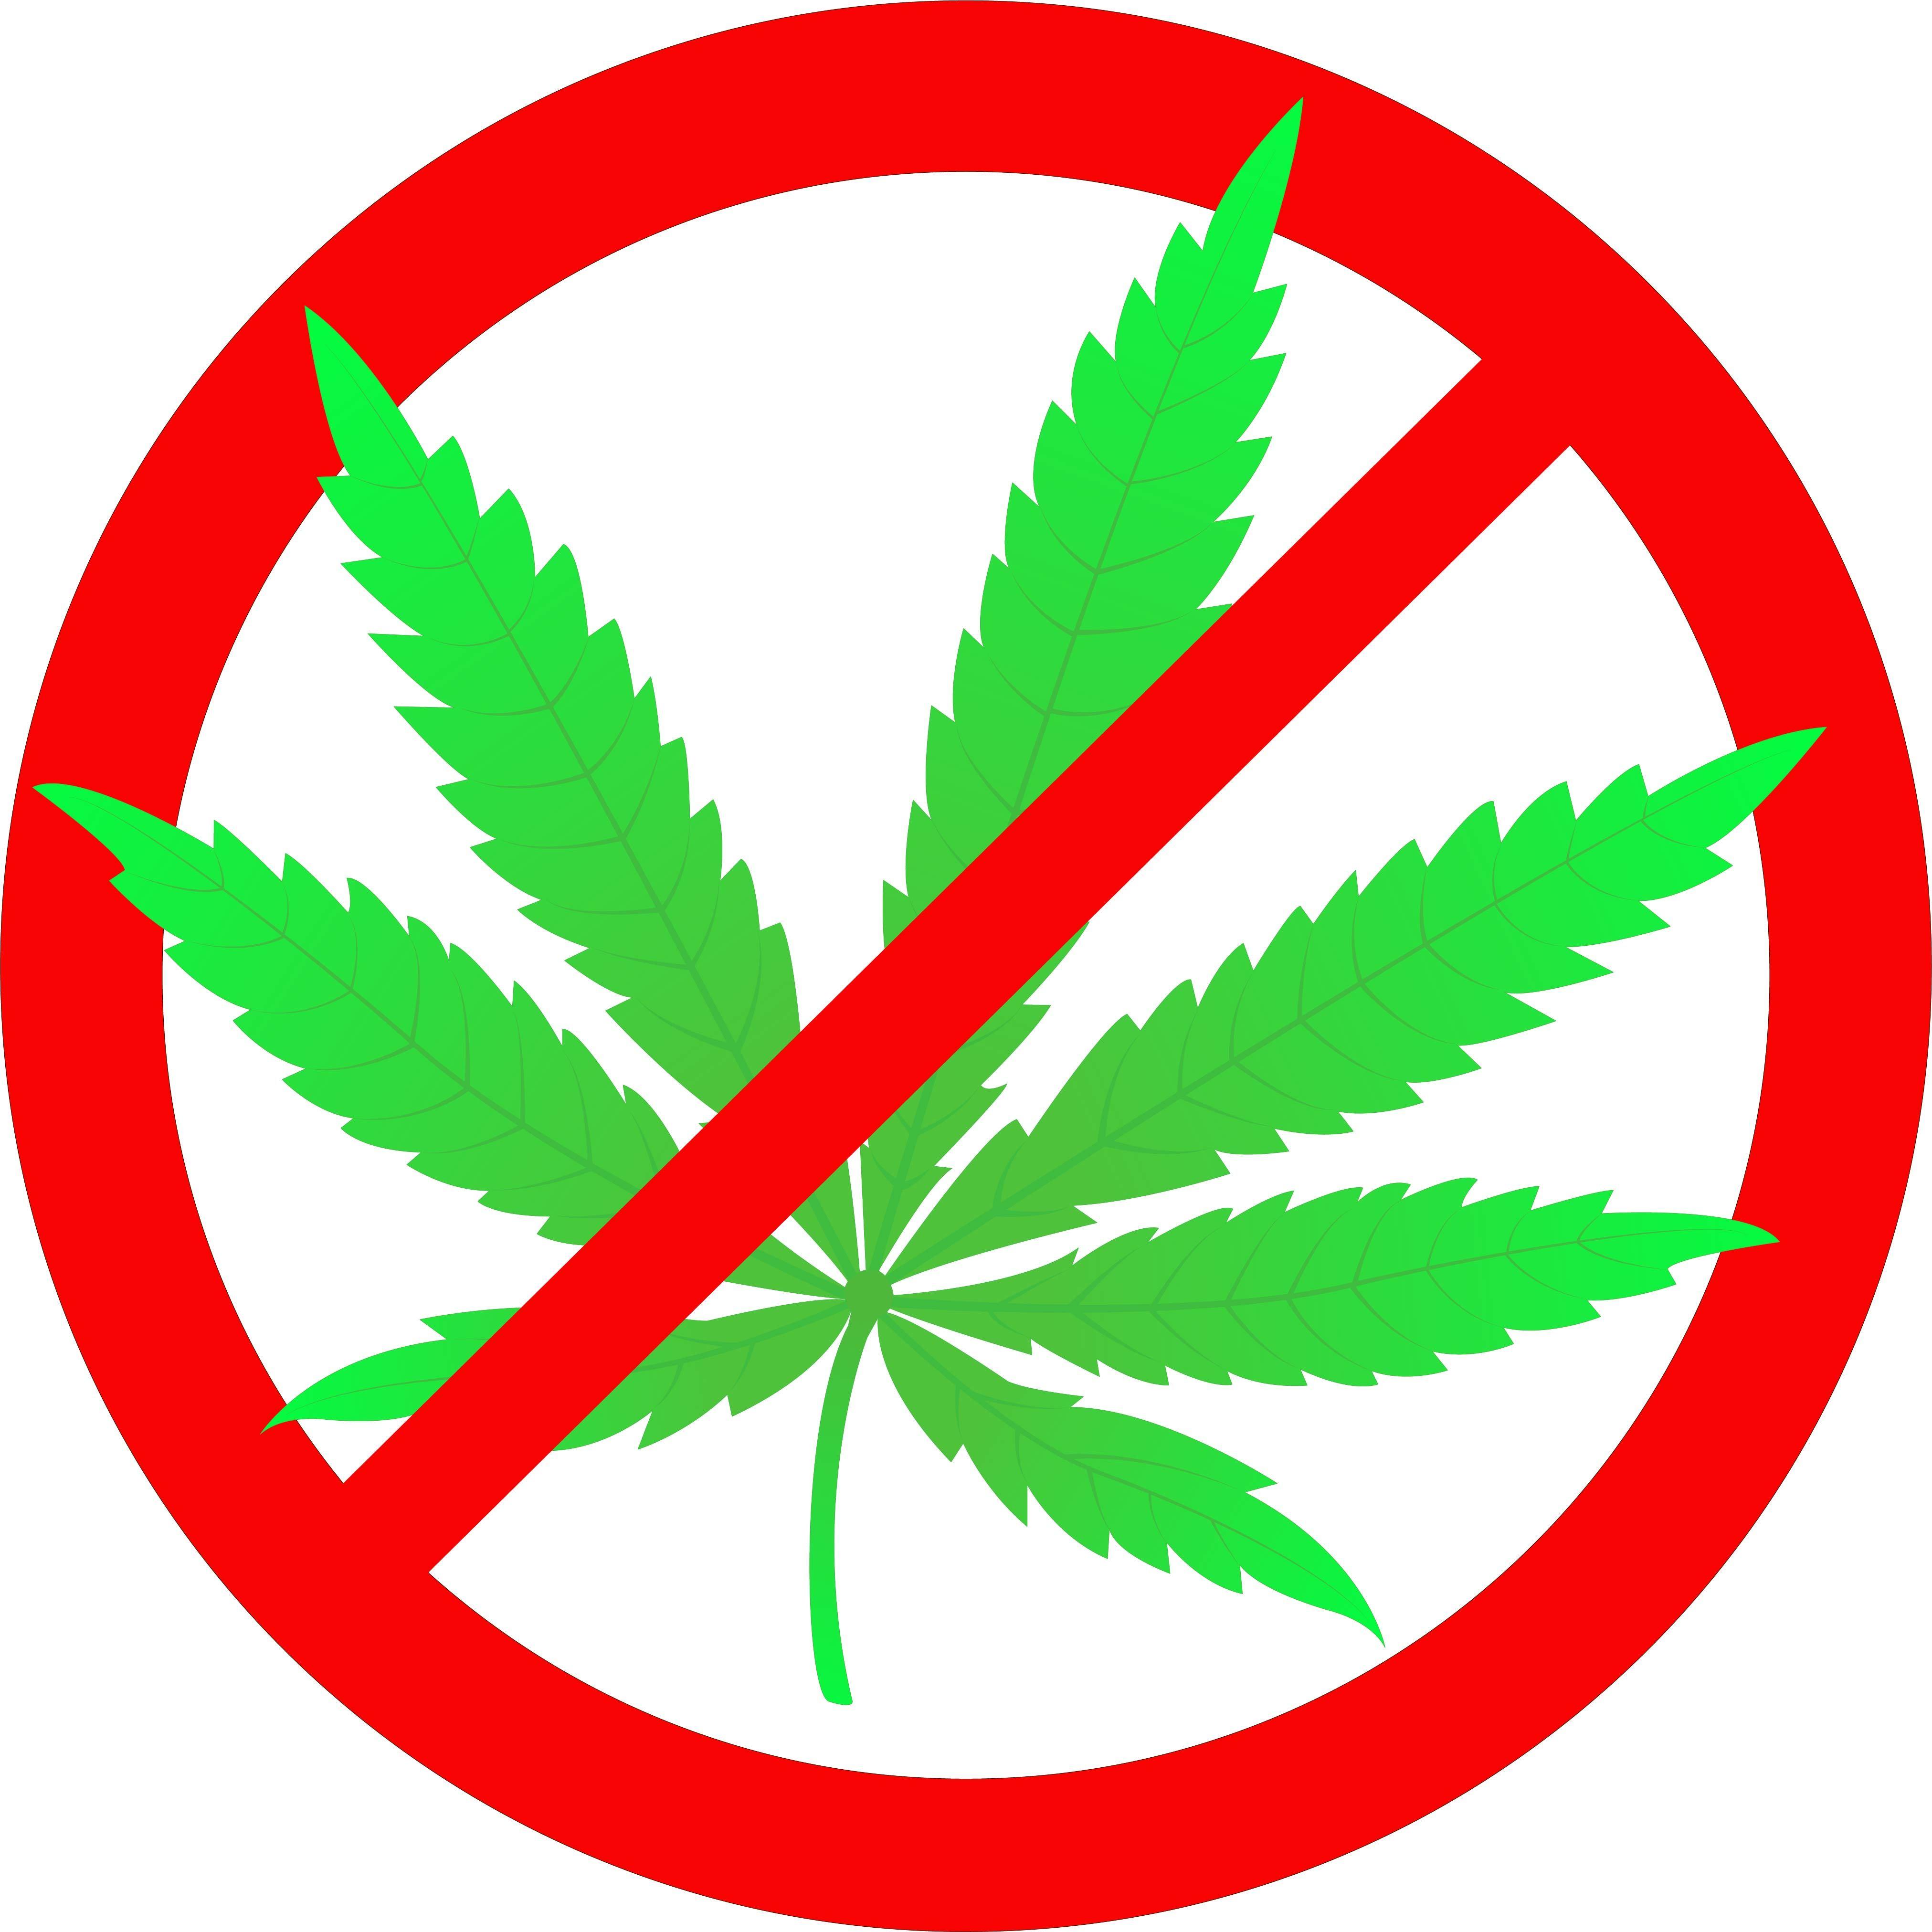 Image of a No Marijuana logo